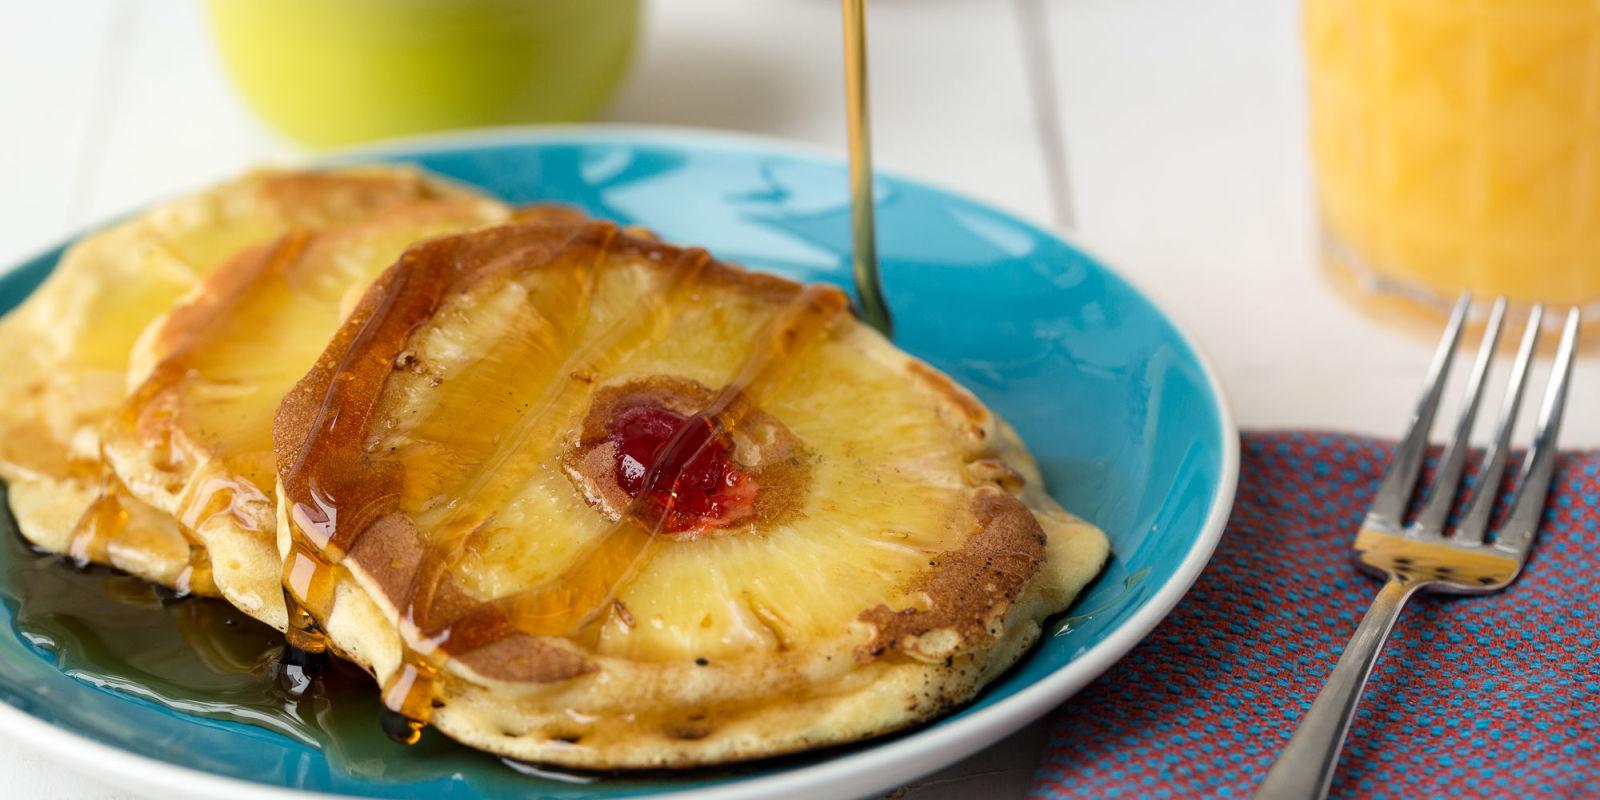 Easter Pineapple Upside Down Cake